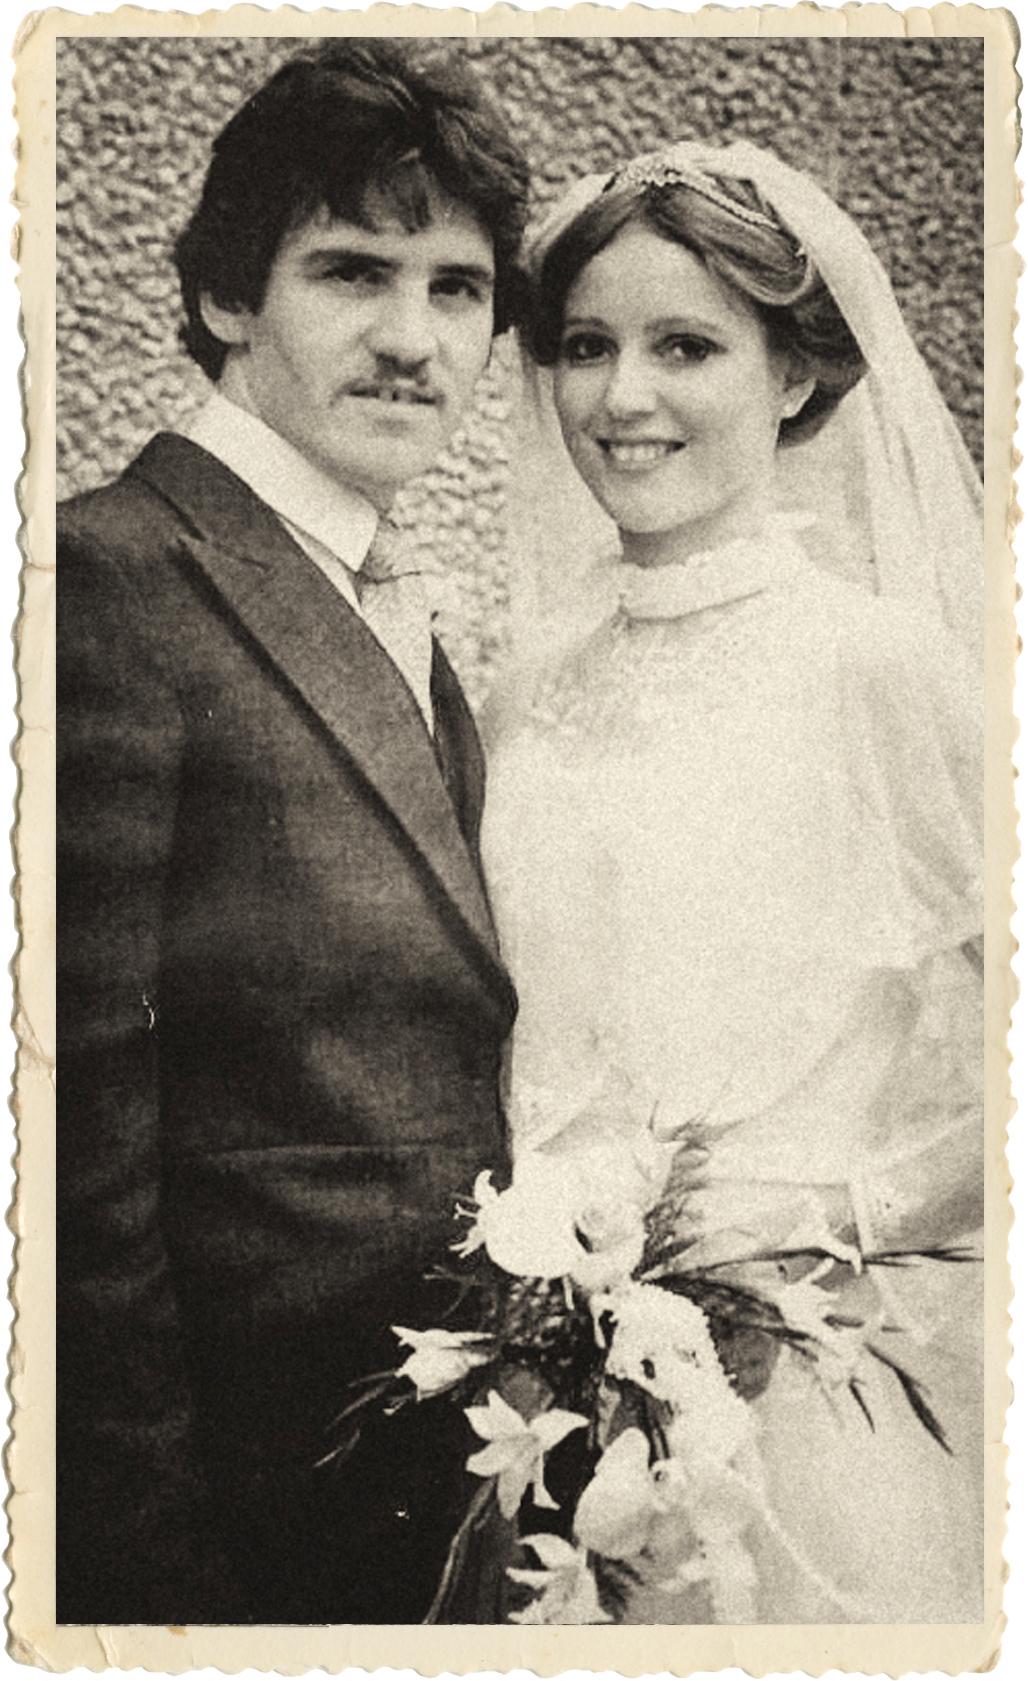 Gerard & Imelda Hagan